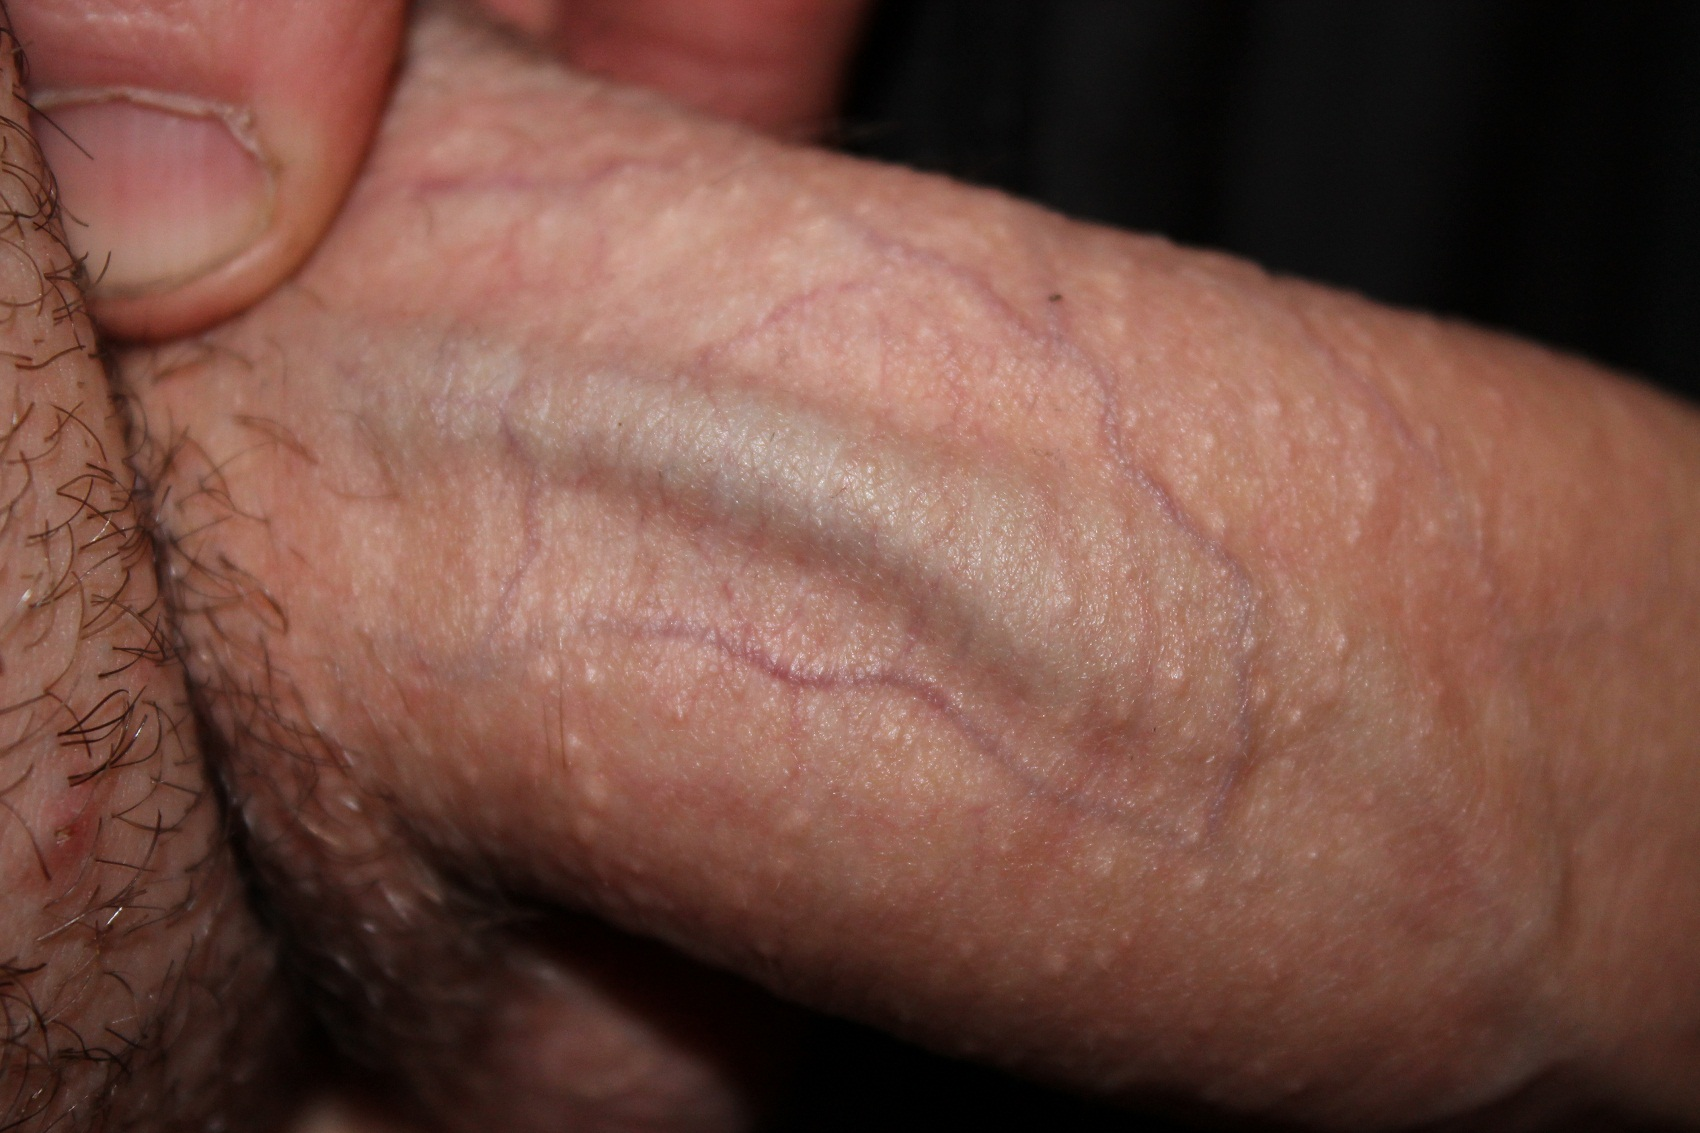 genitalniy-gerpes-na-polovom-chlene